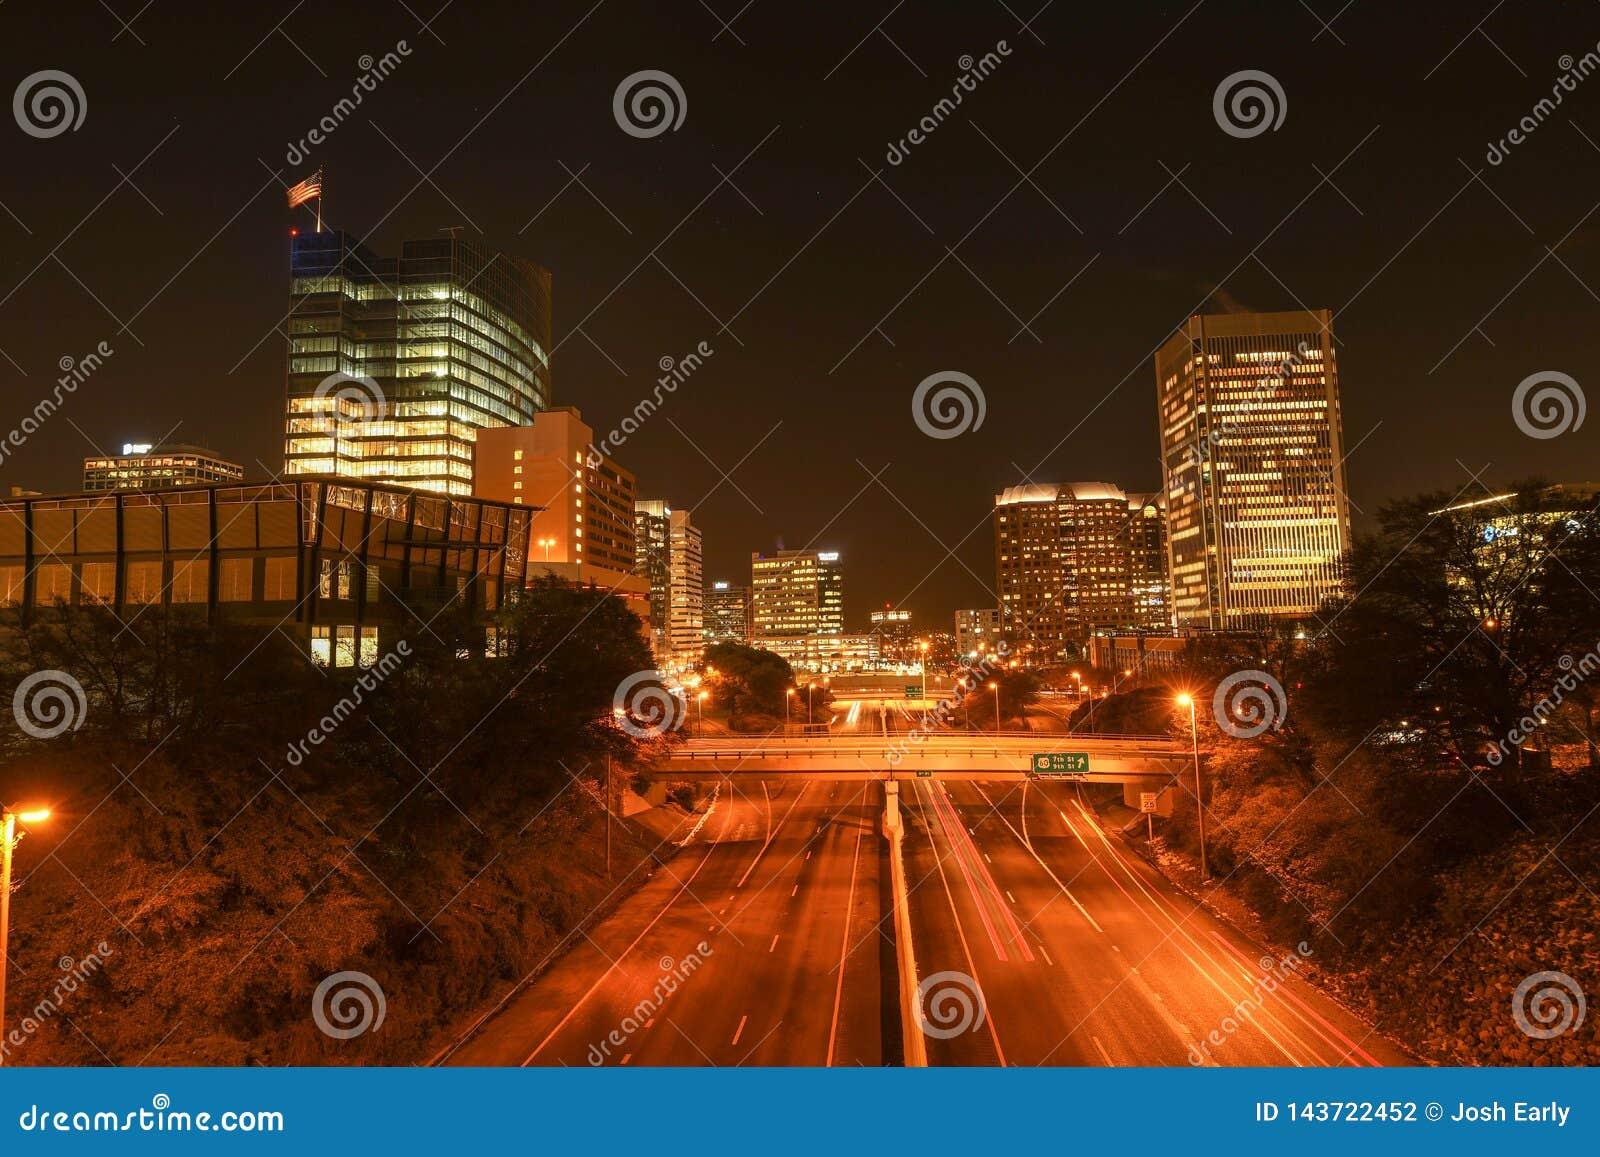 Richmond, Virginia at night looking downtown